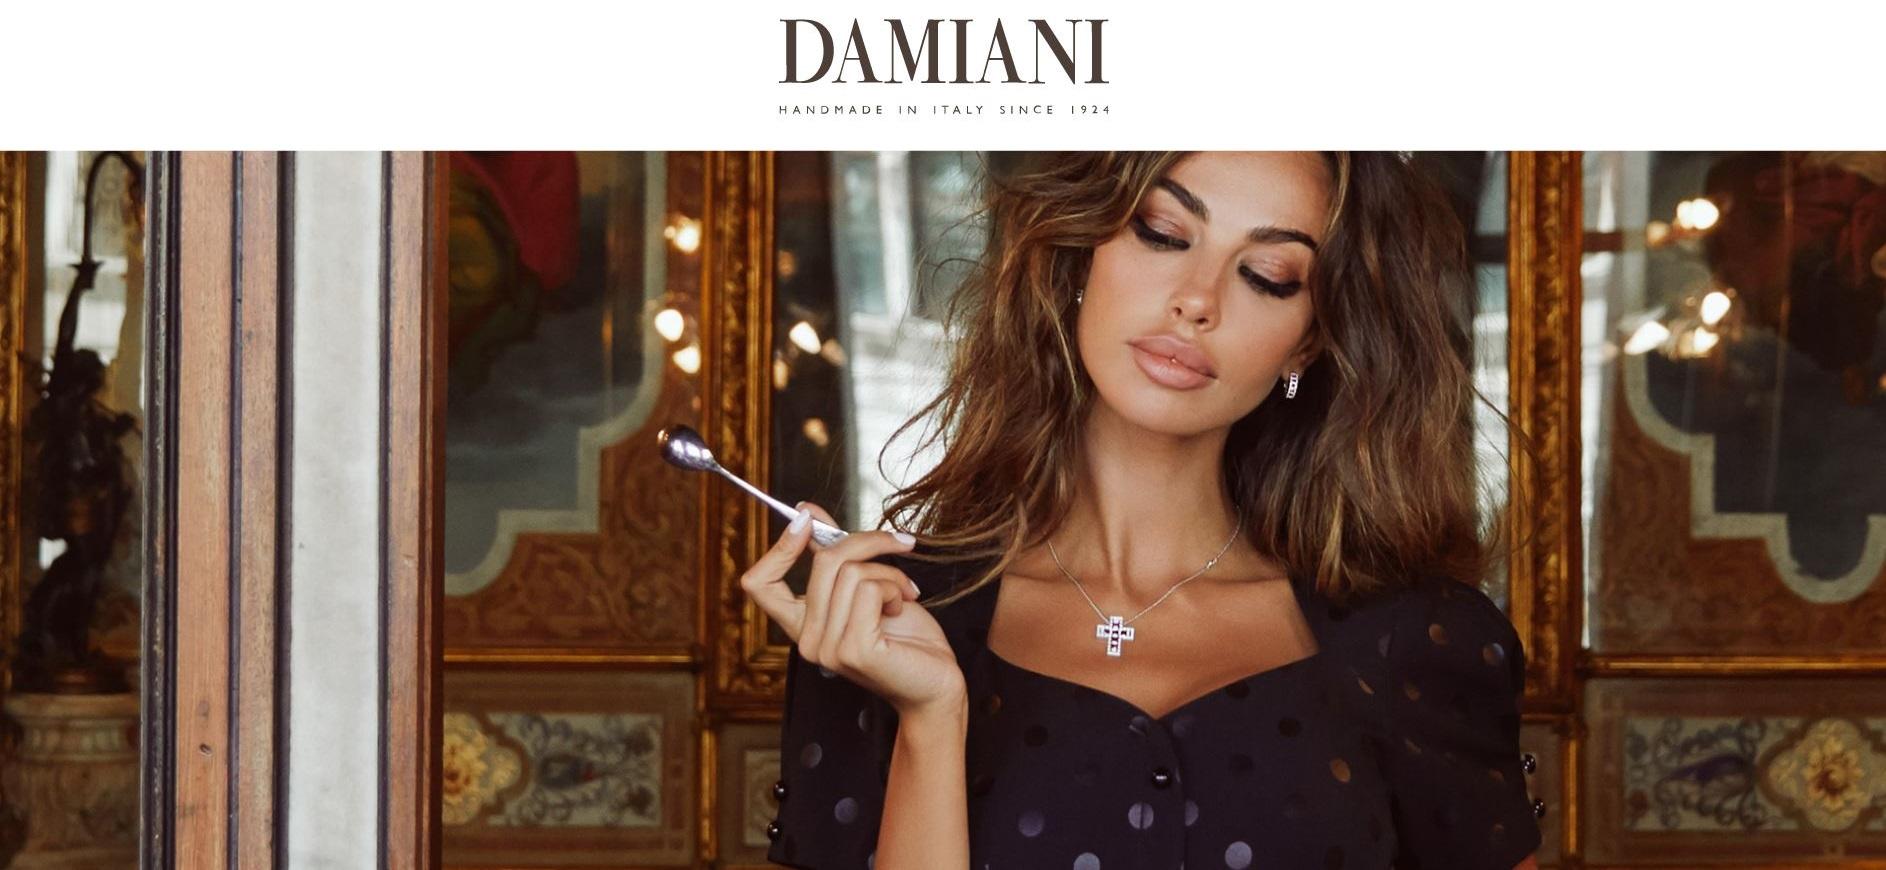 damiani_header_collana